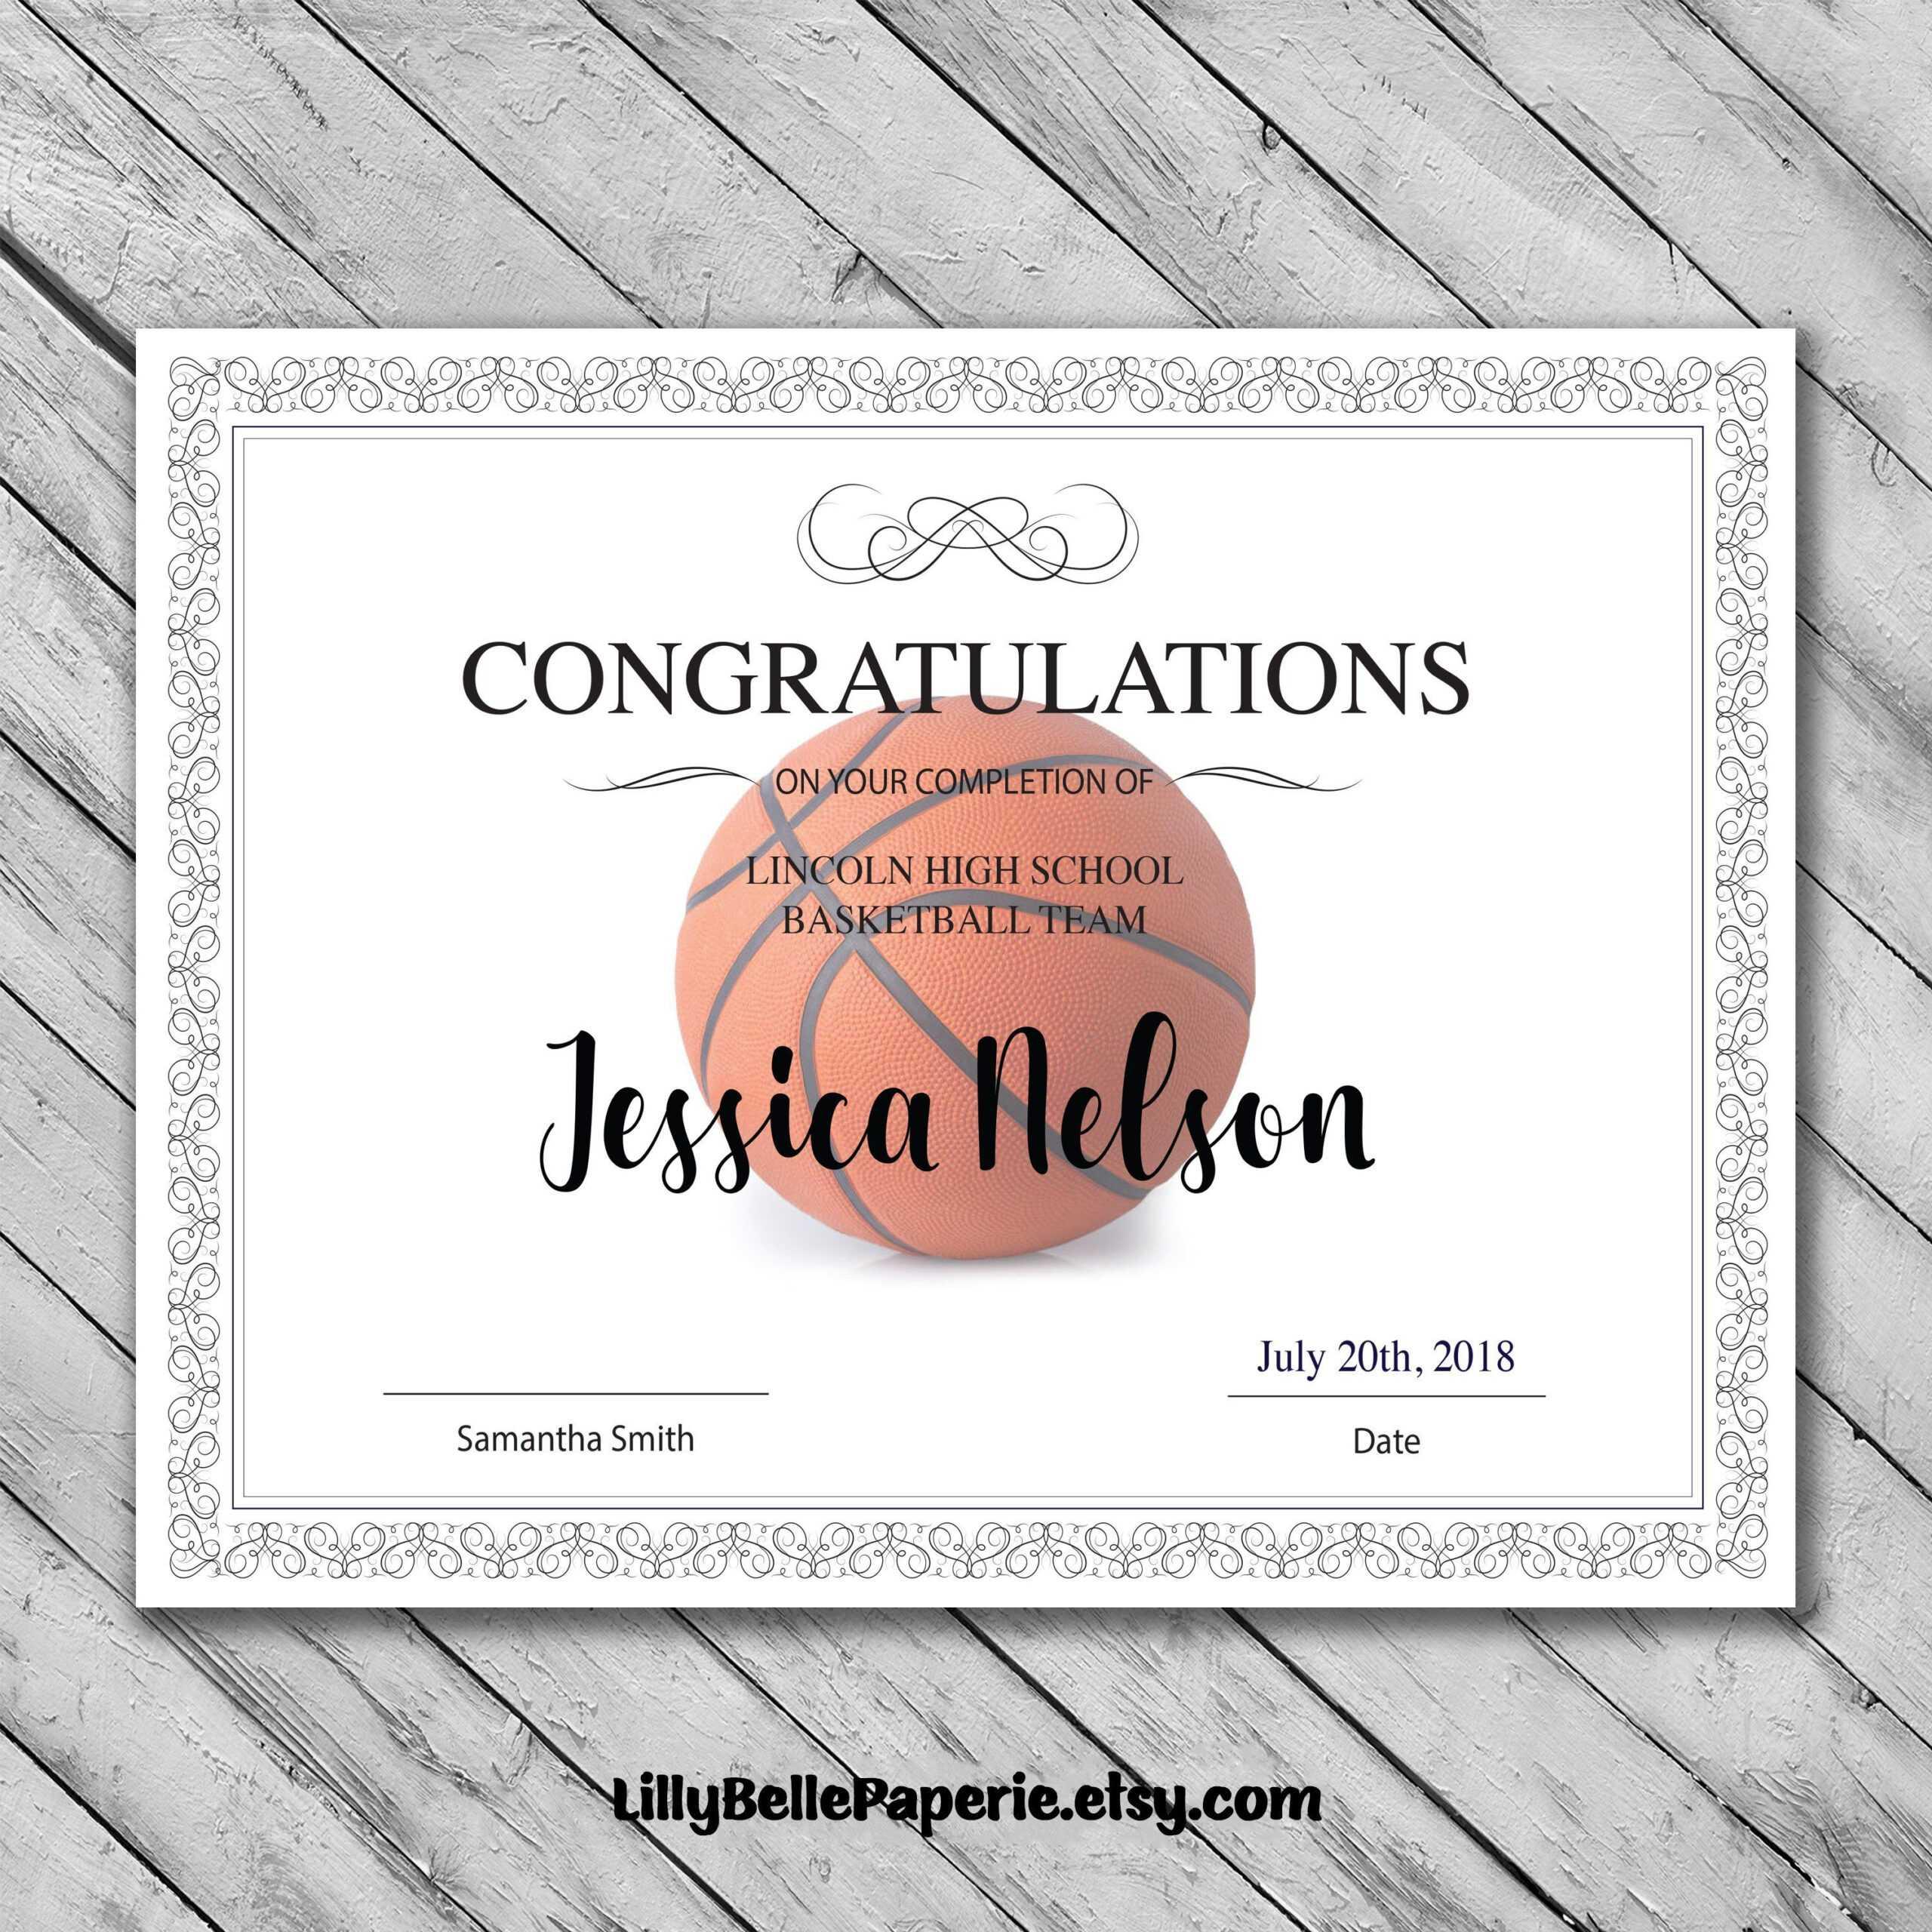 Basketball Camp Certificate Template - Atlantaauctionco For Basketball Camp Certificate Template